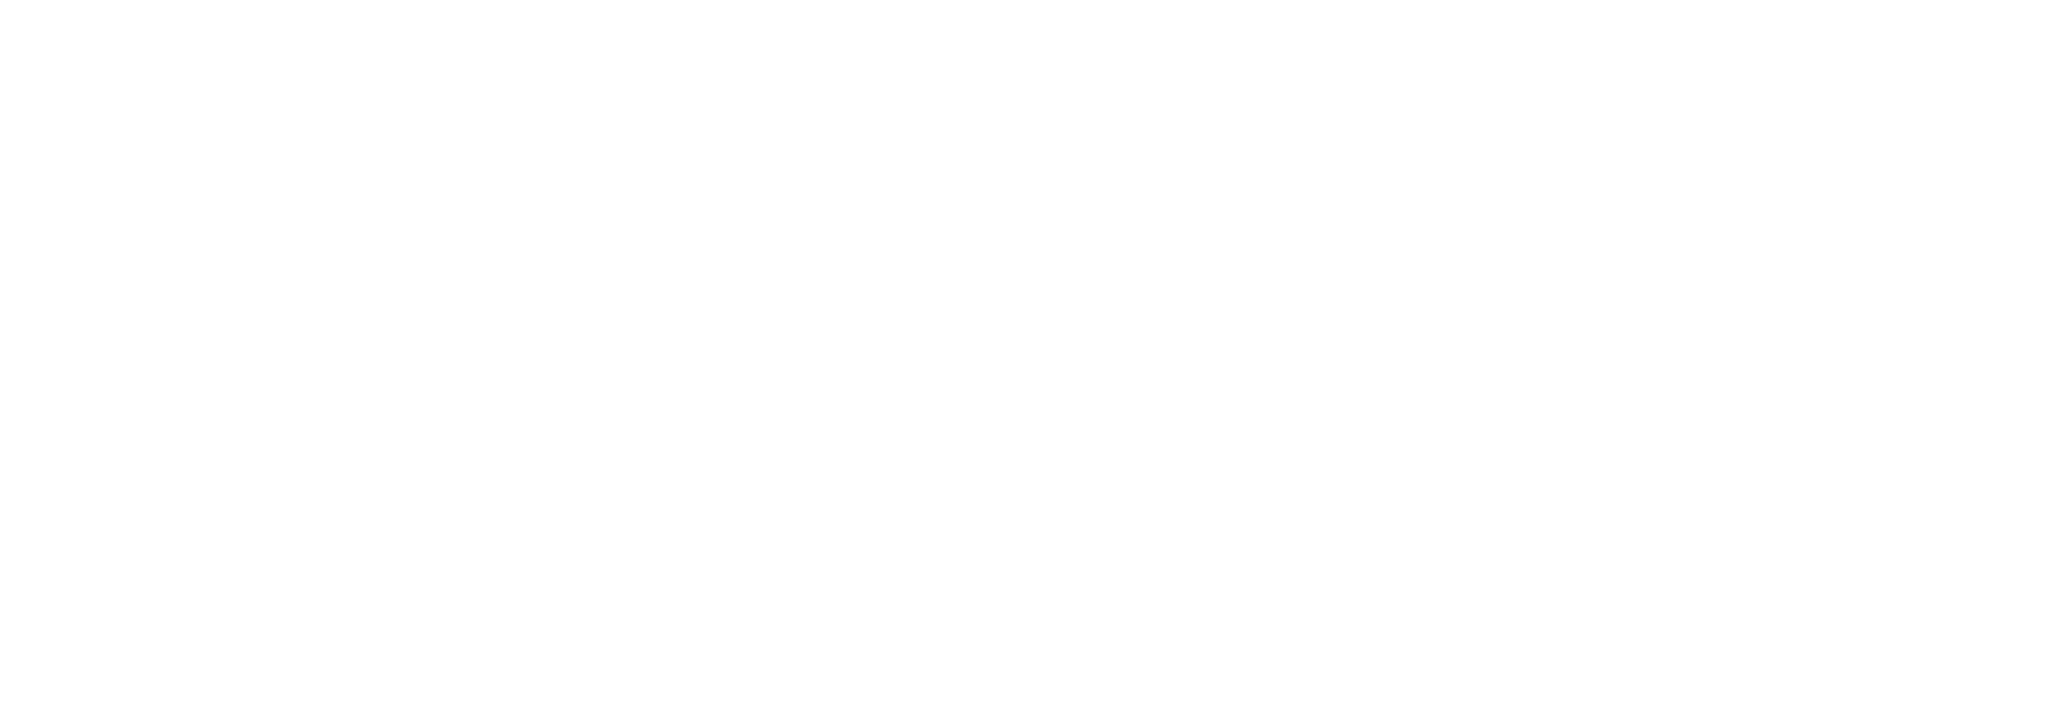 SET Dřez SCHOCK Formhaus D-100S Nero + baterie Cosmo Nero 525001